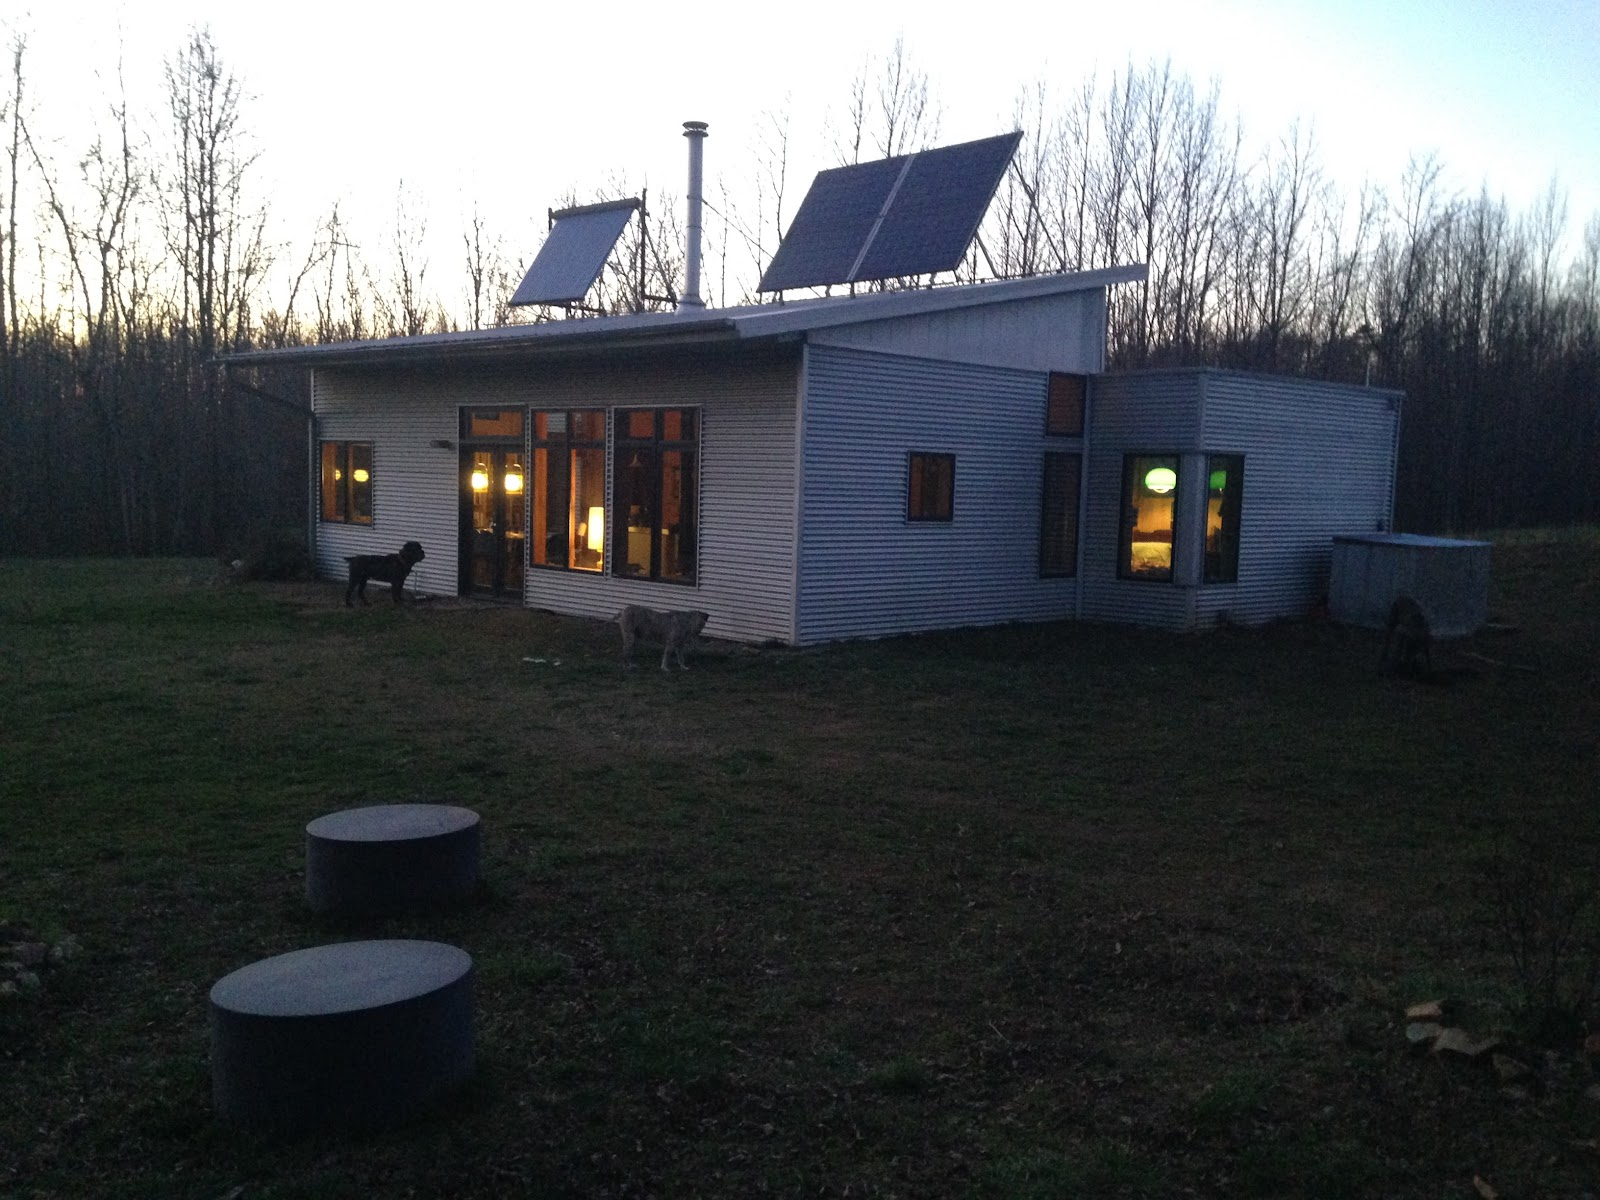 Modern Prefab House Off Grid Thinks On Concrete Slabs